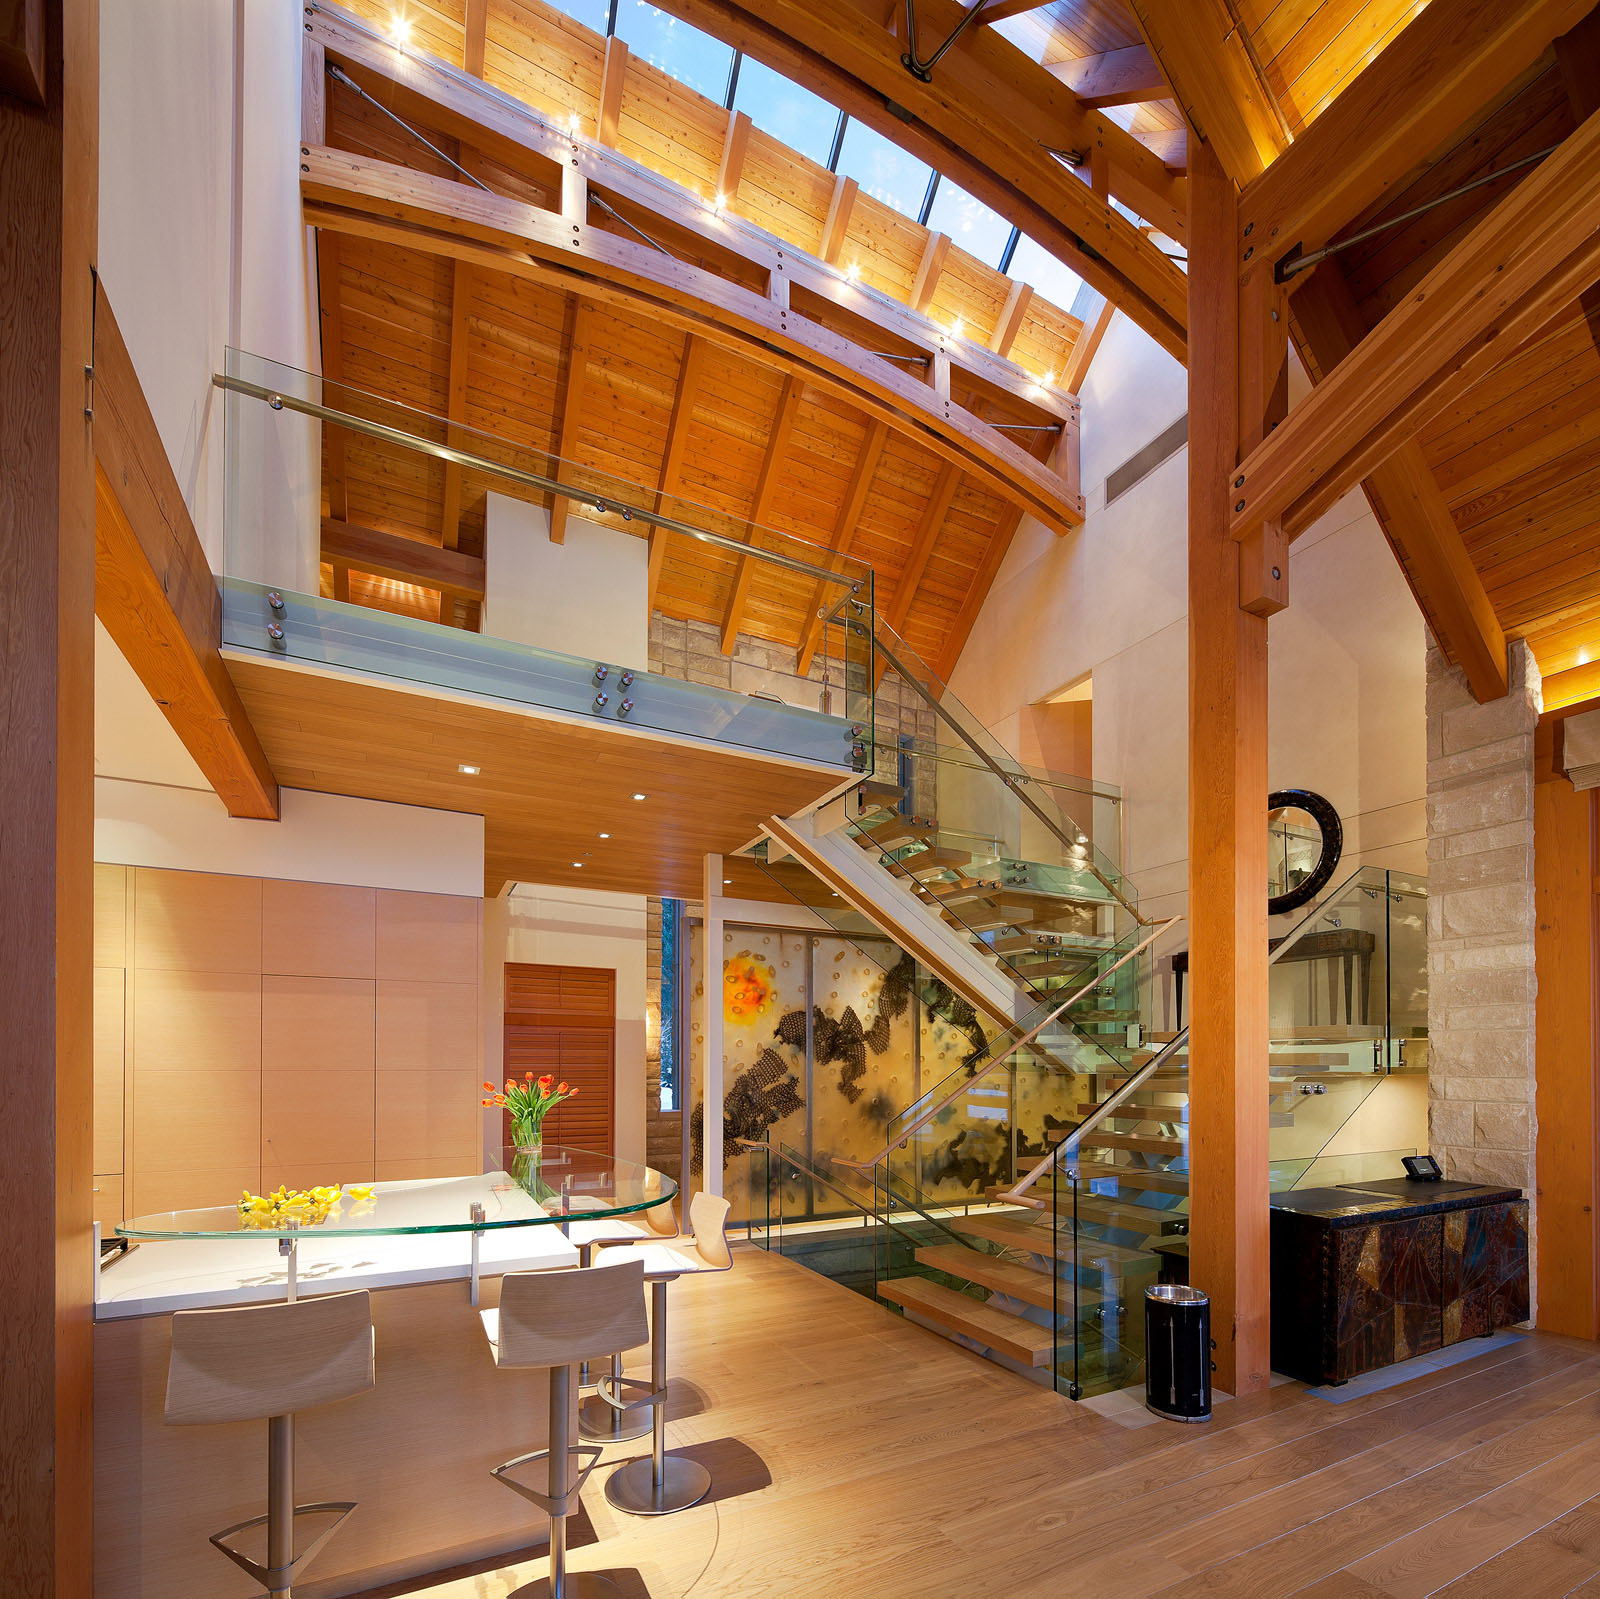 Home Design VN | Home Design Ideas, Home Decor, DIY, Furniture ...